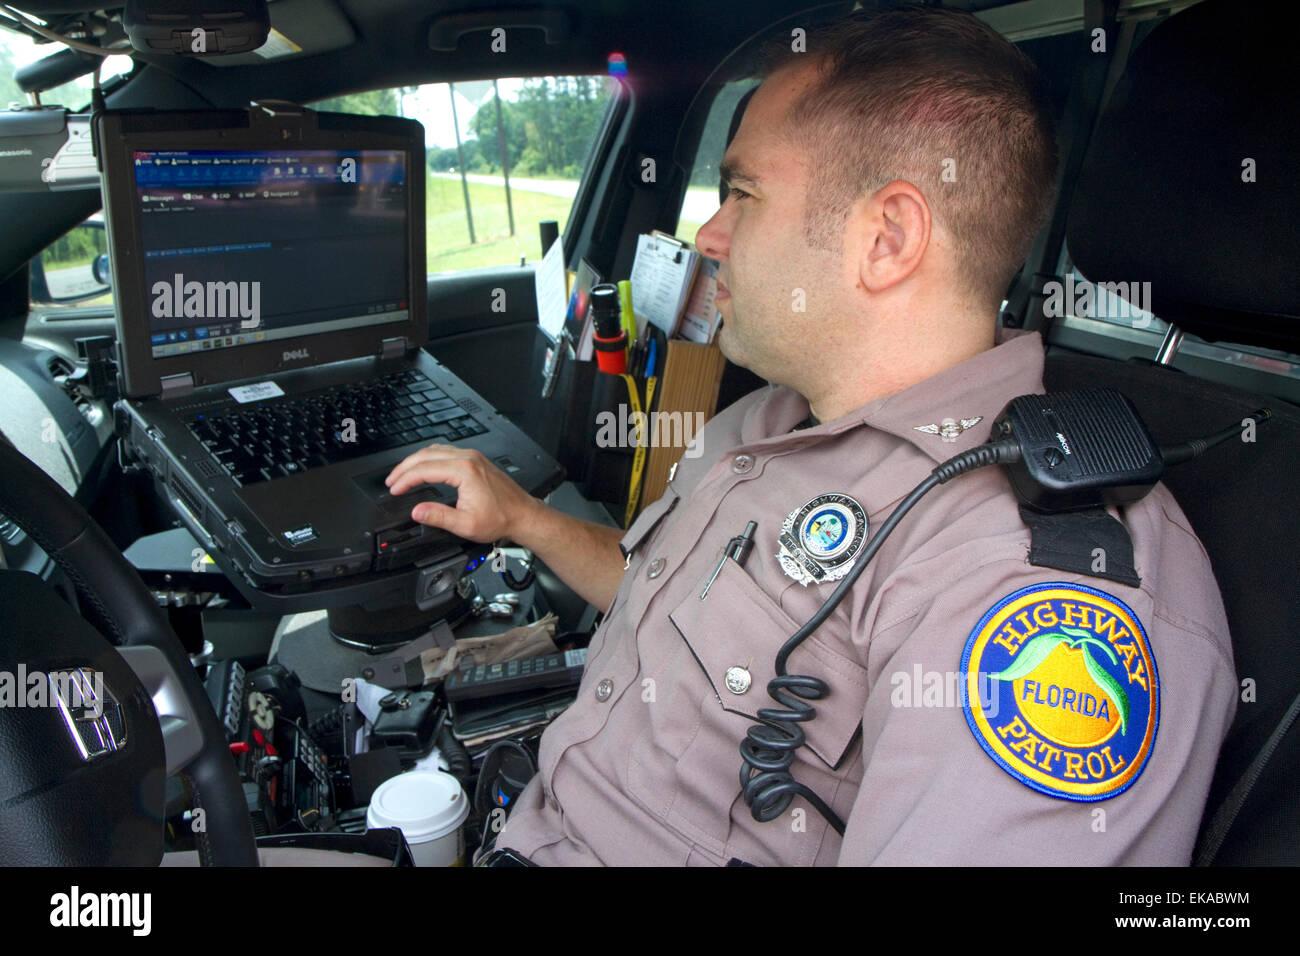 Florida state trooper using computer in patrol car. - Stock Image